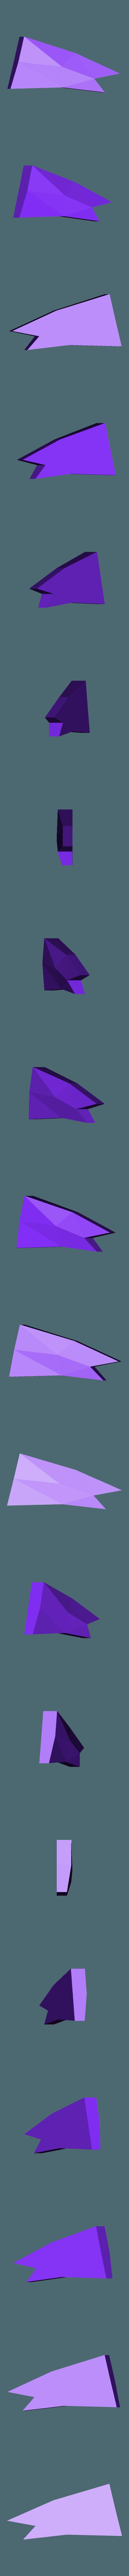 SailShip_Flag.stl Download free STL file Marine Life Wall Project • 3D printer template, Double_Alfa_3D